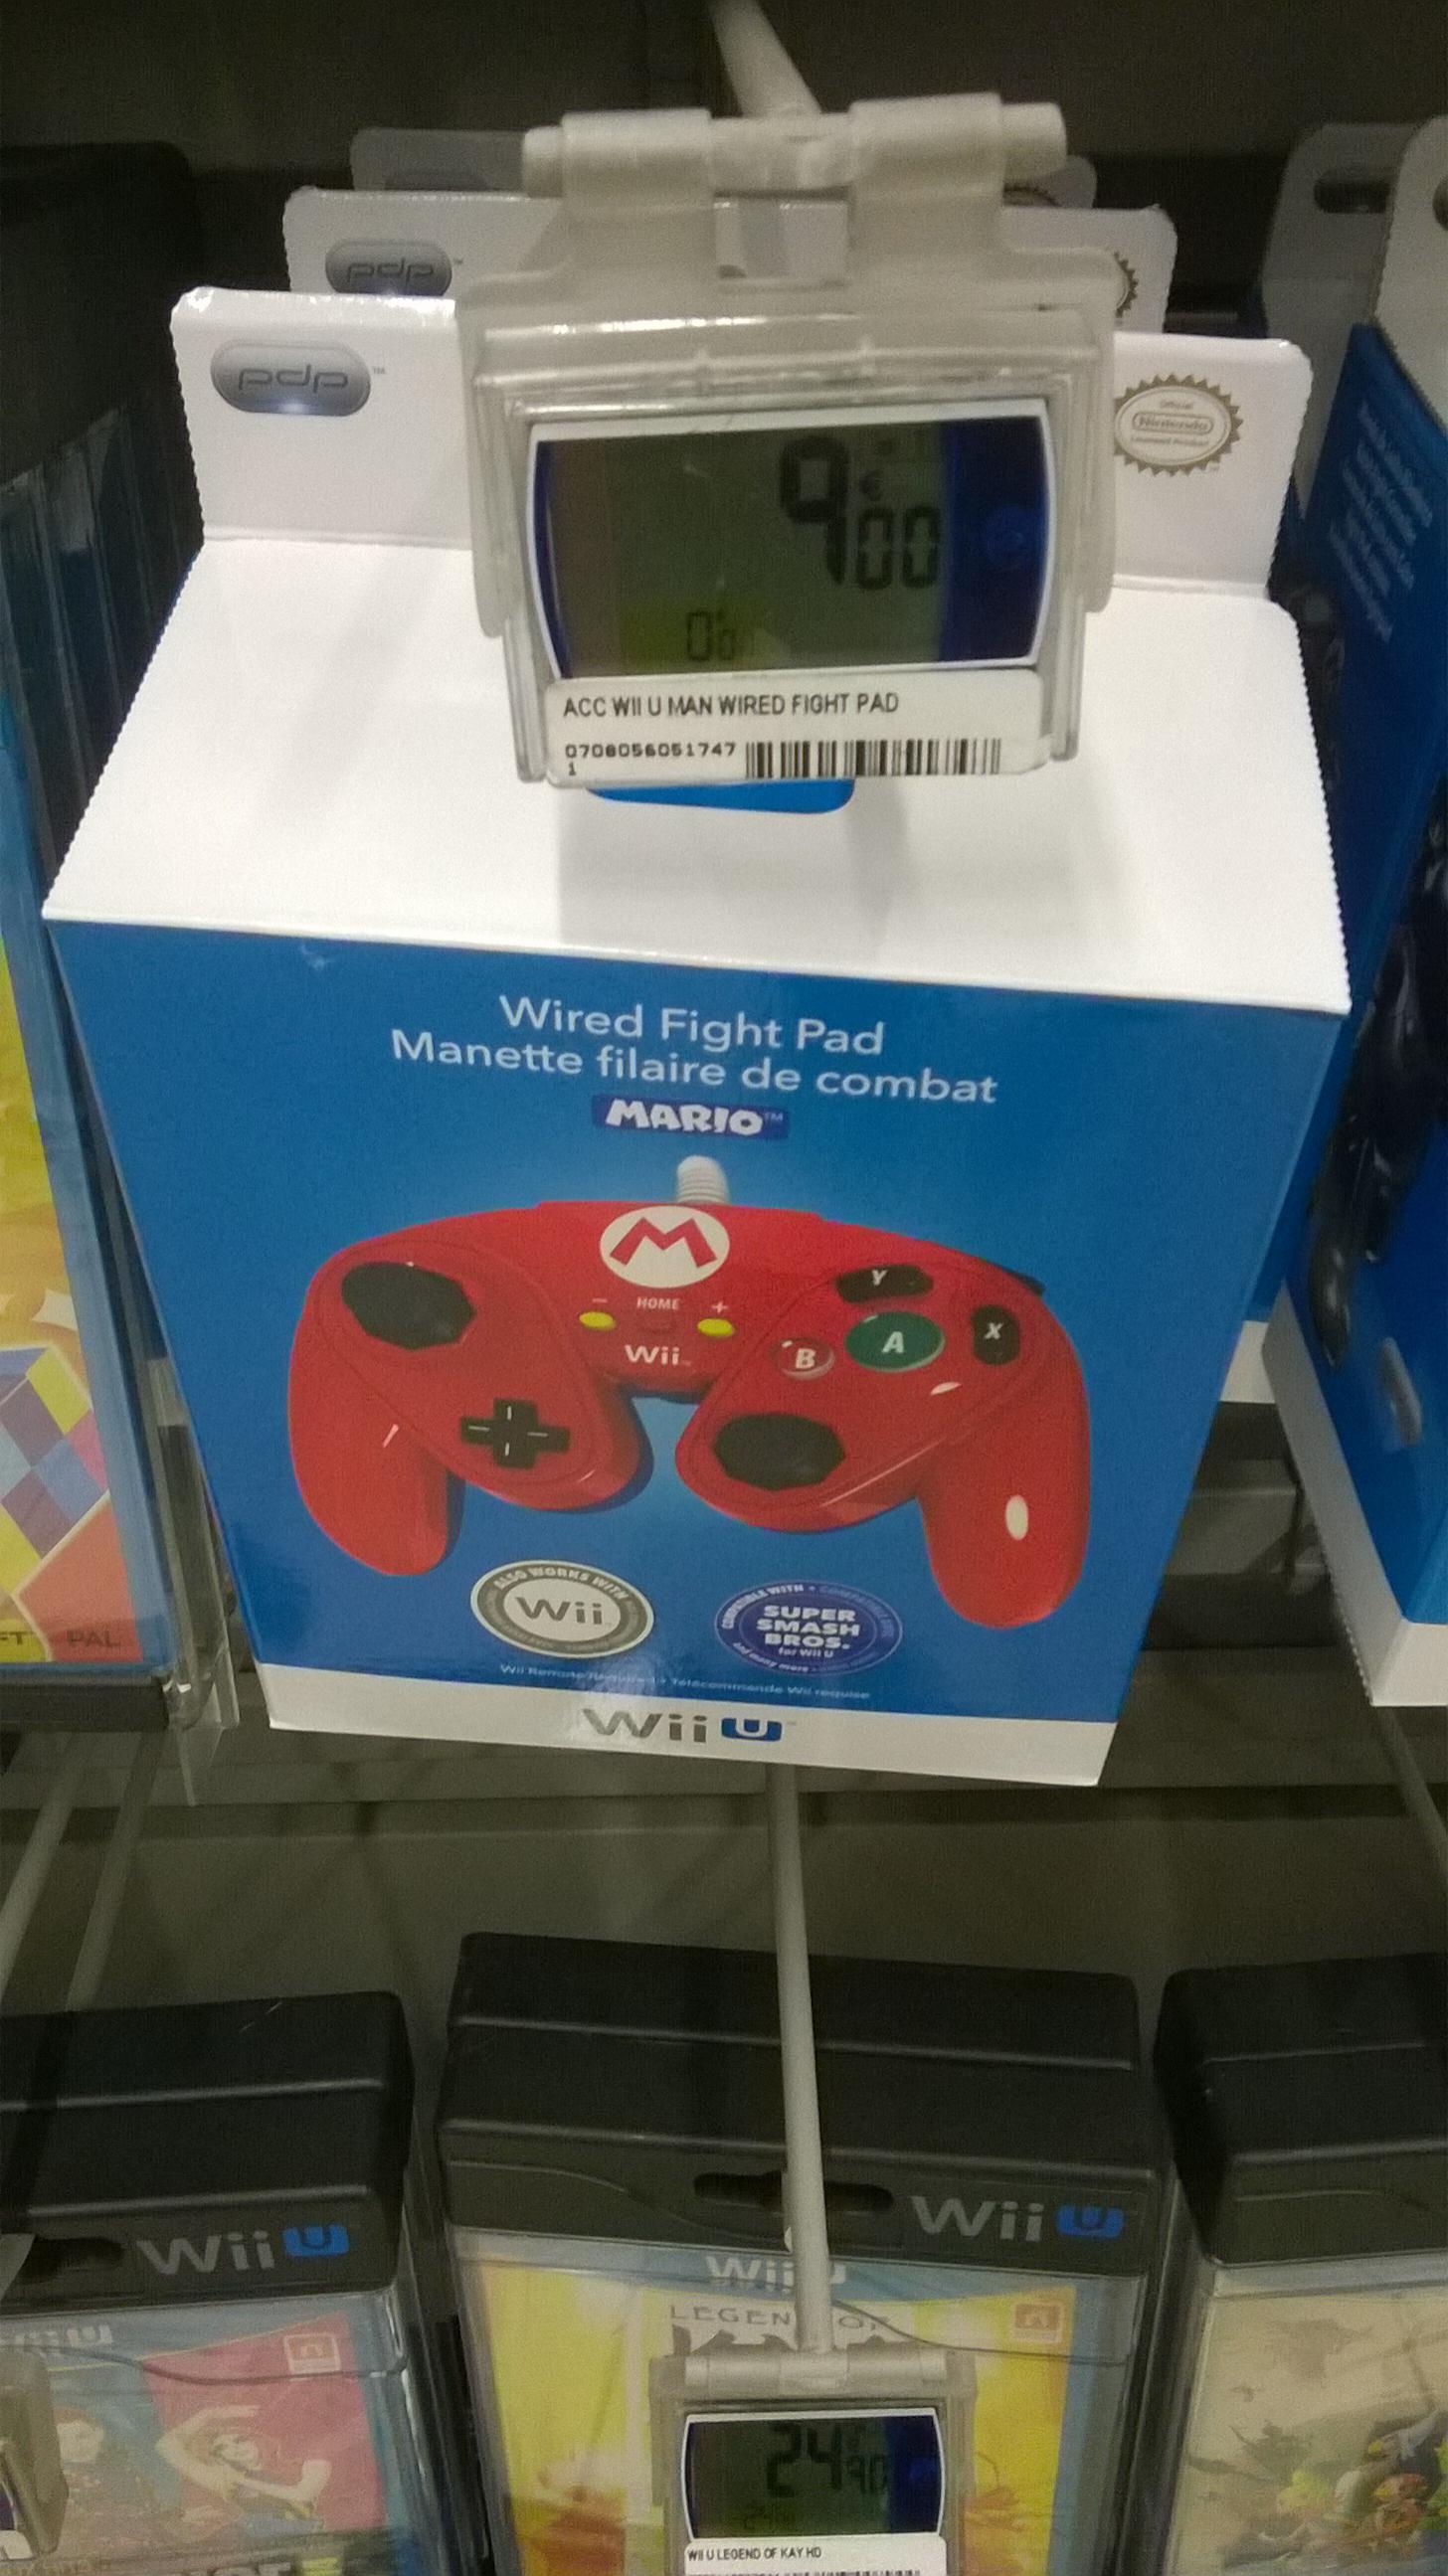 Manette filaire Mario pour Wii U - Rouge